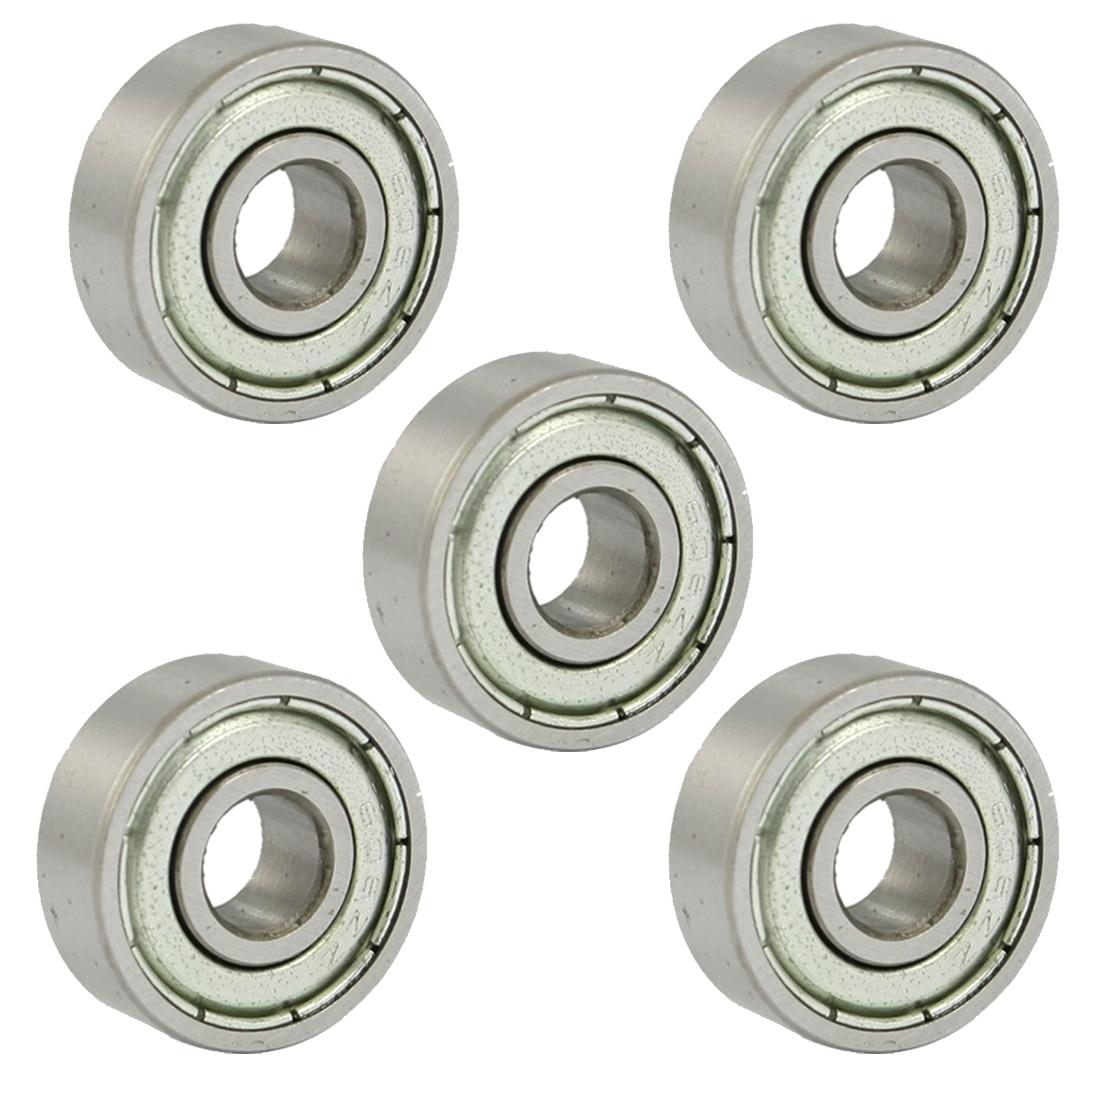 WSFS Hot 606Z 6 x 17 x 6mm Metal Miniature Deep Groove Ball Bearings 5 Pcs wsfs hot 10 pcs 625zz 5mm x 16mm x 5mm